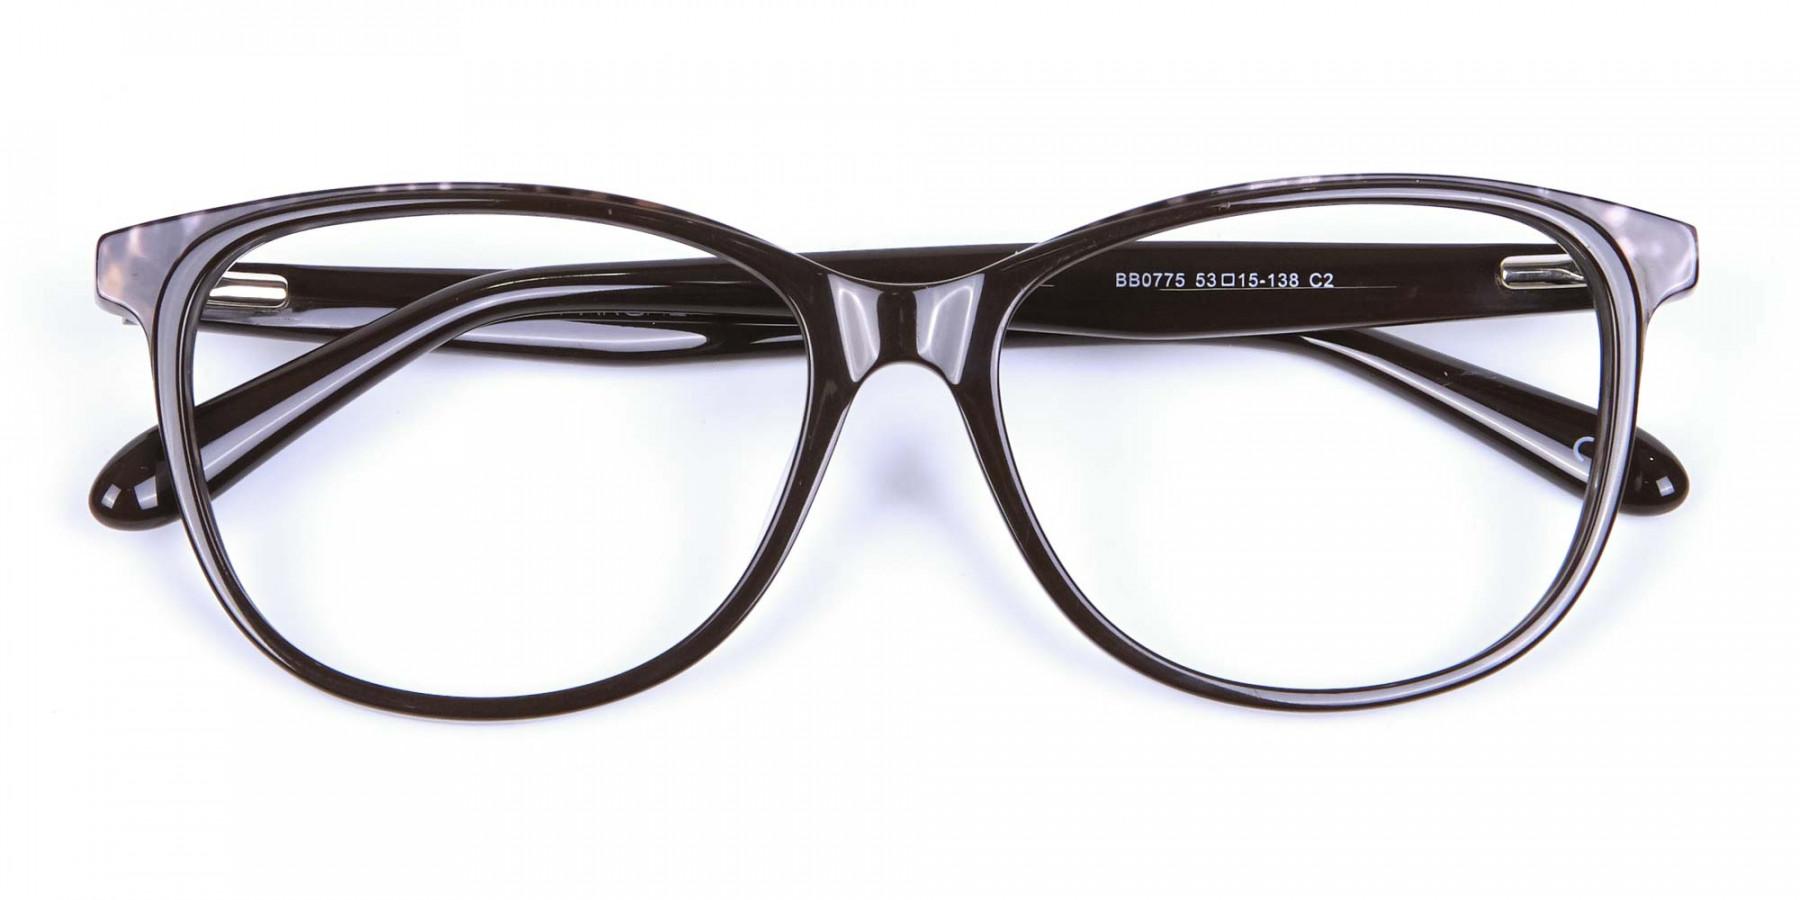 Leopard Brown Cat Eye Glasses for Women